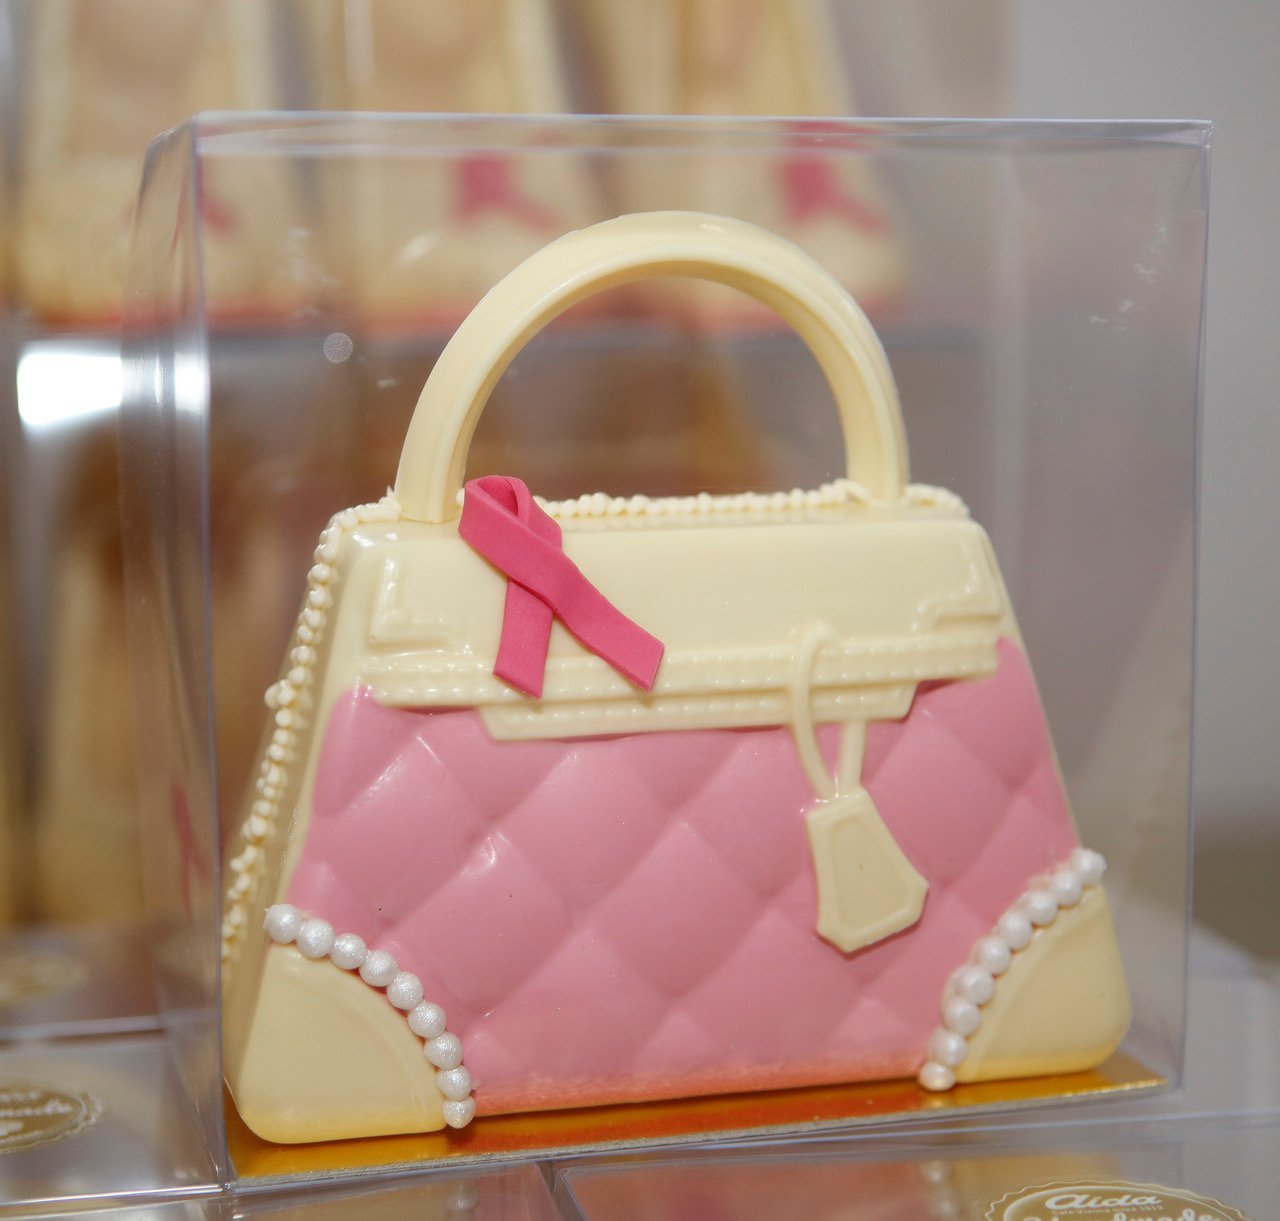 aida-pink-ribbon-schoko-tasche-weiss-rosa-_m5s7655